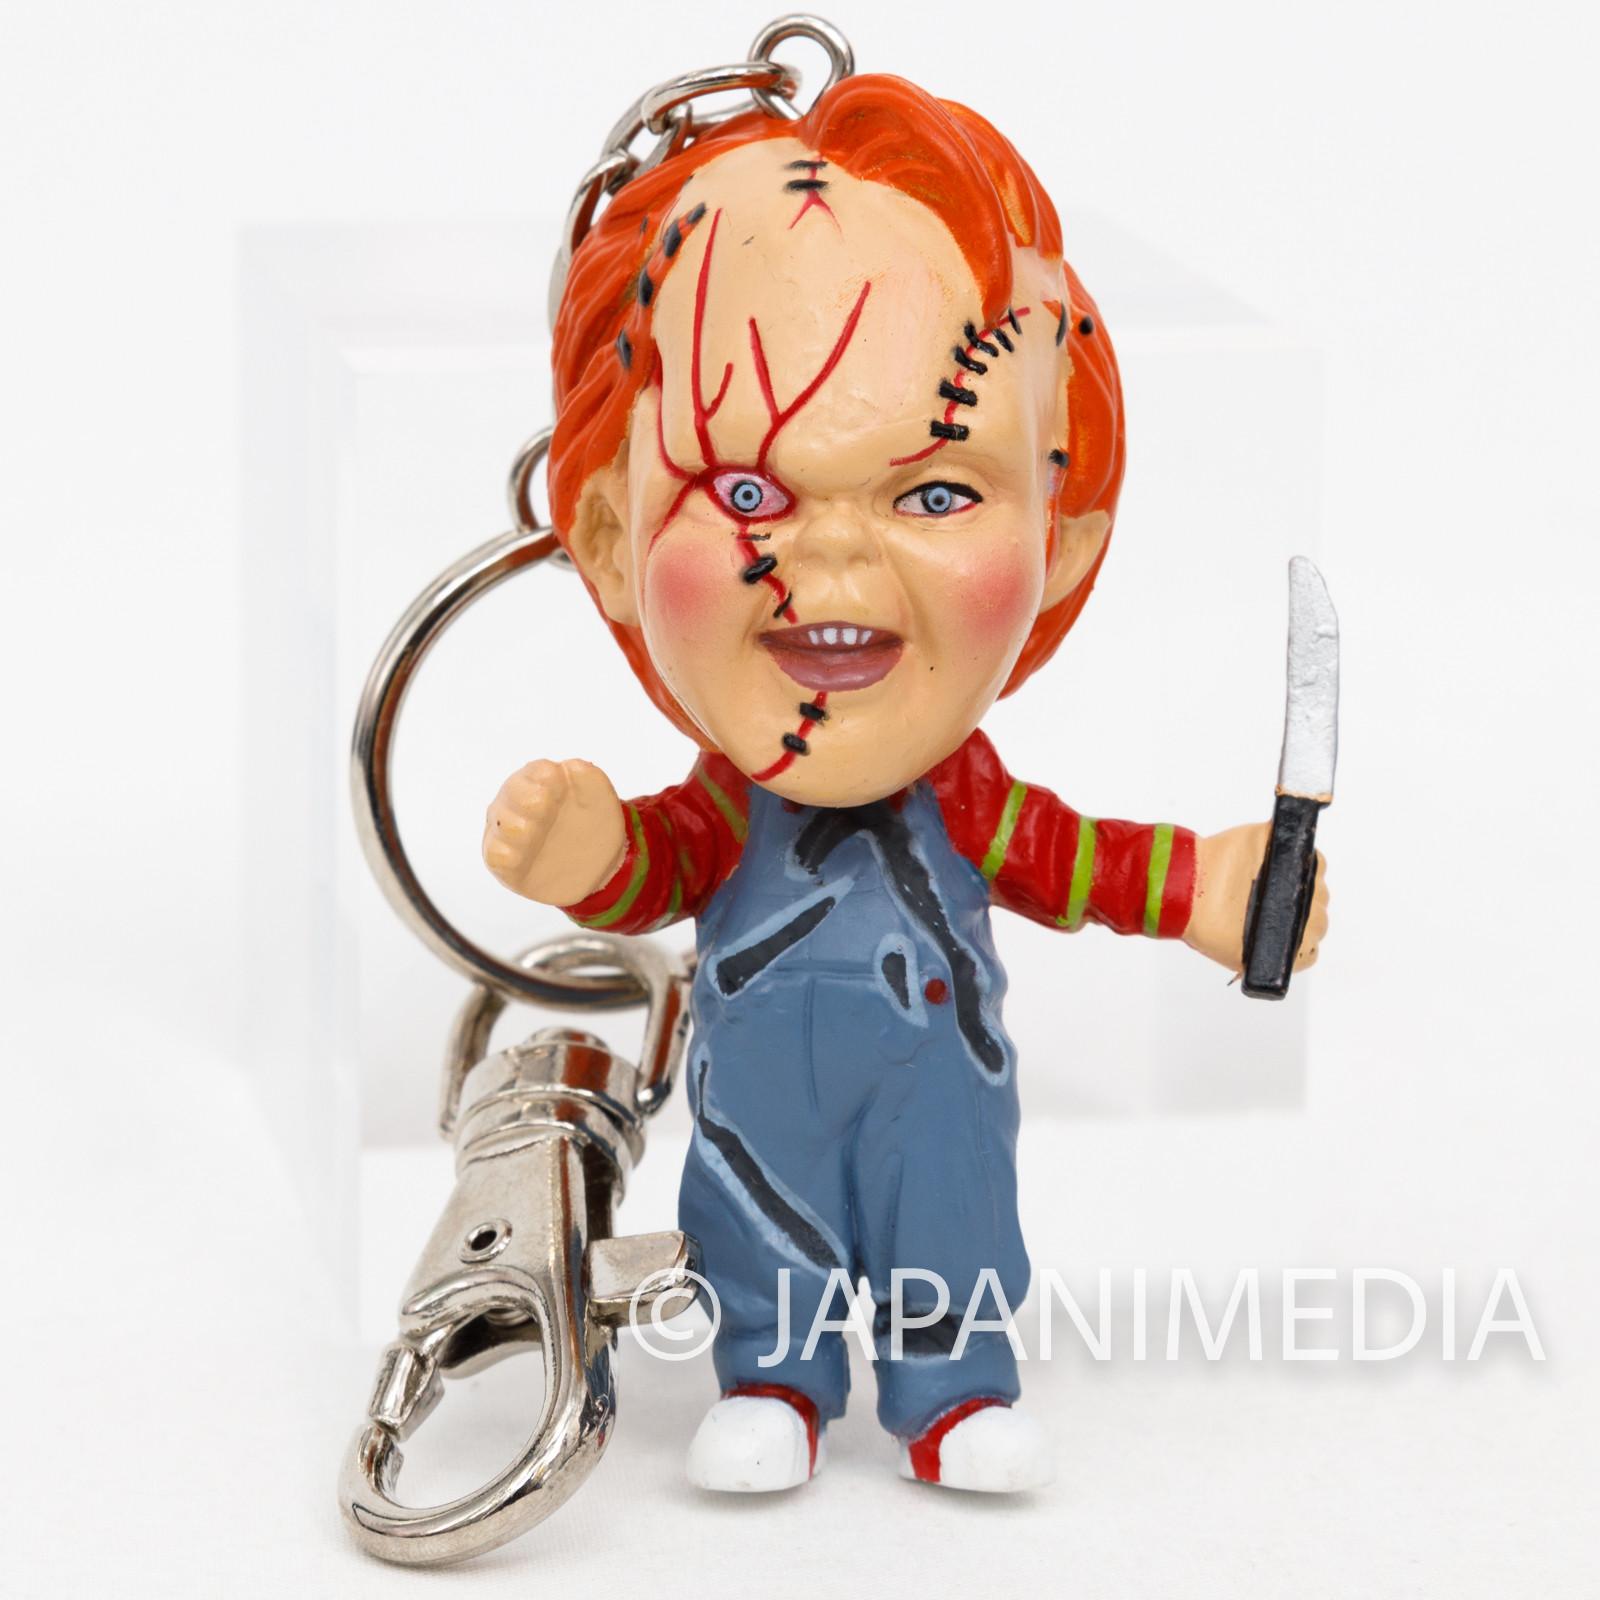 Bride of Chucky Chucky Little Big Head Figure Keychain Child's Play